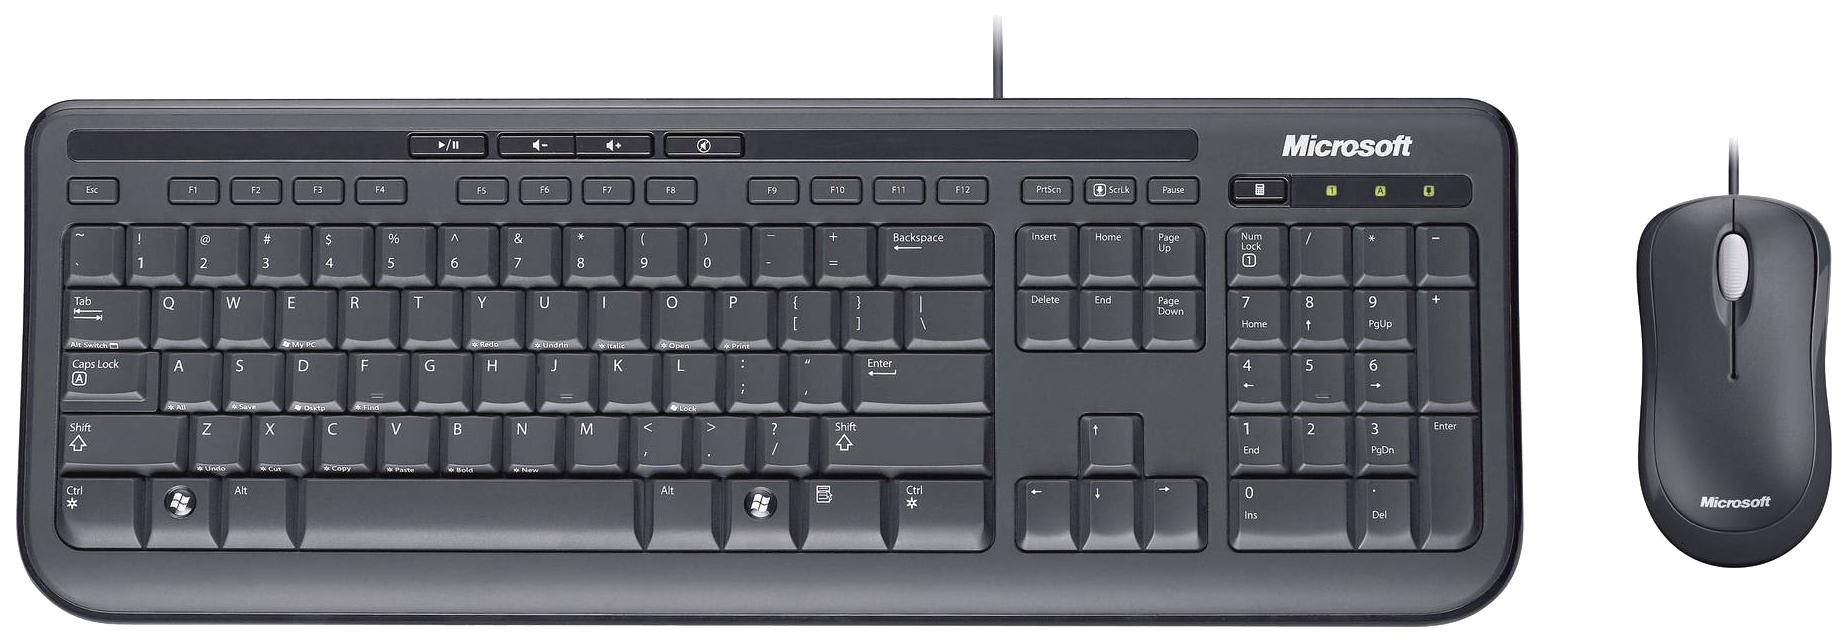 Комплект клавиатура и мышь Microsoft Wired Desktop 600